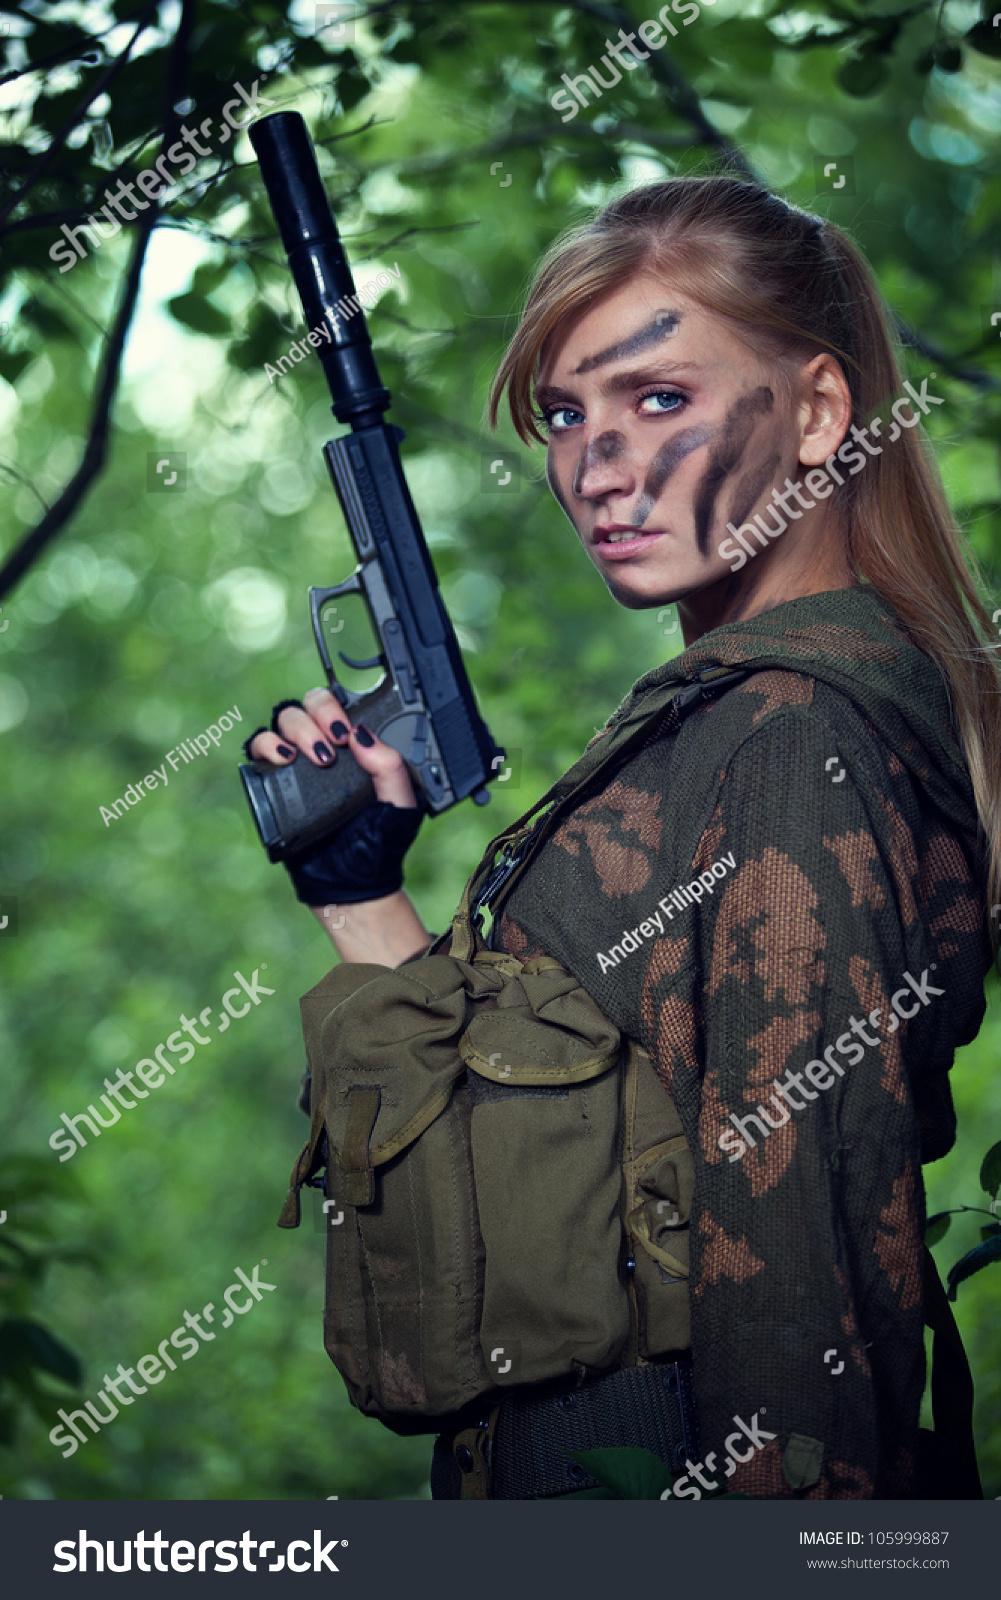 Camo Girl Stock Photo 105999887 - Shutterstock